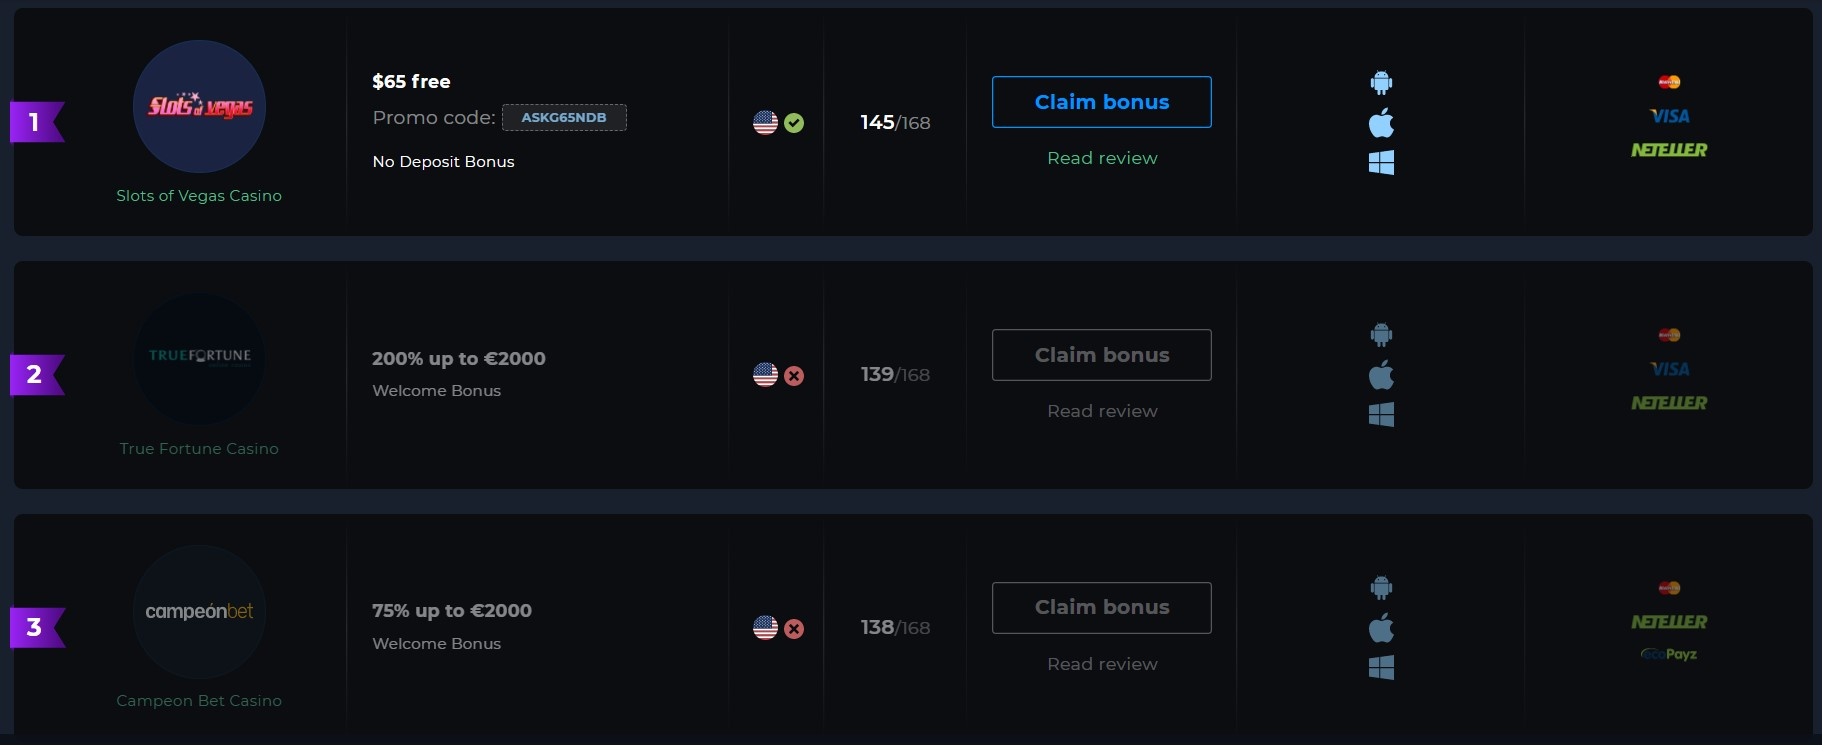 How to Claim 45 Free Spins Bonus